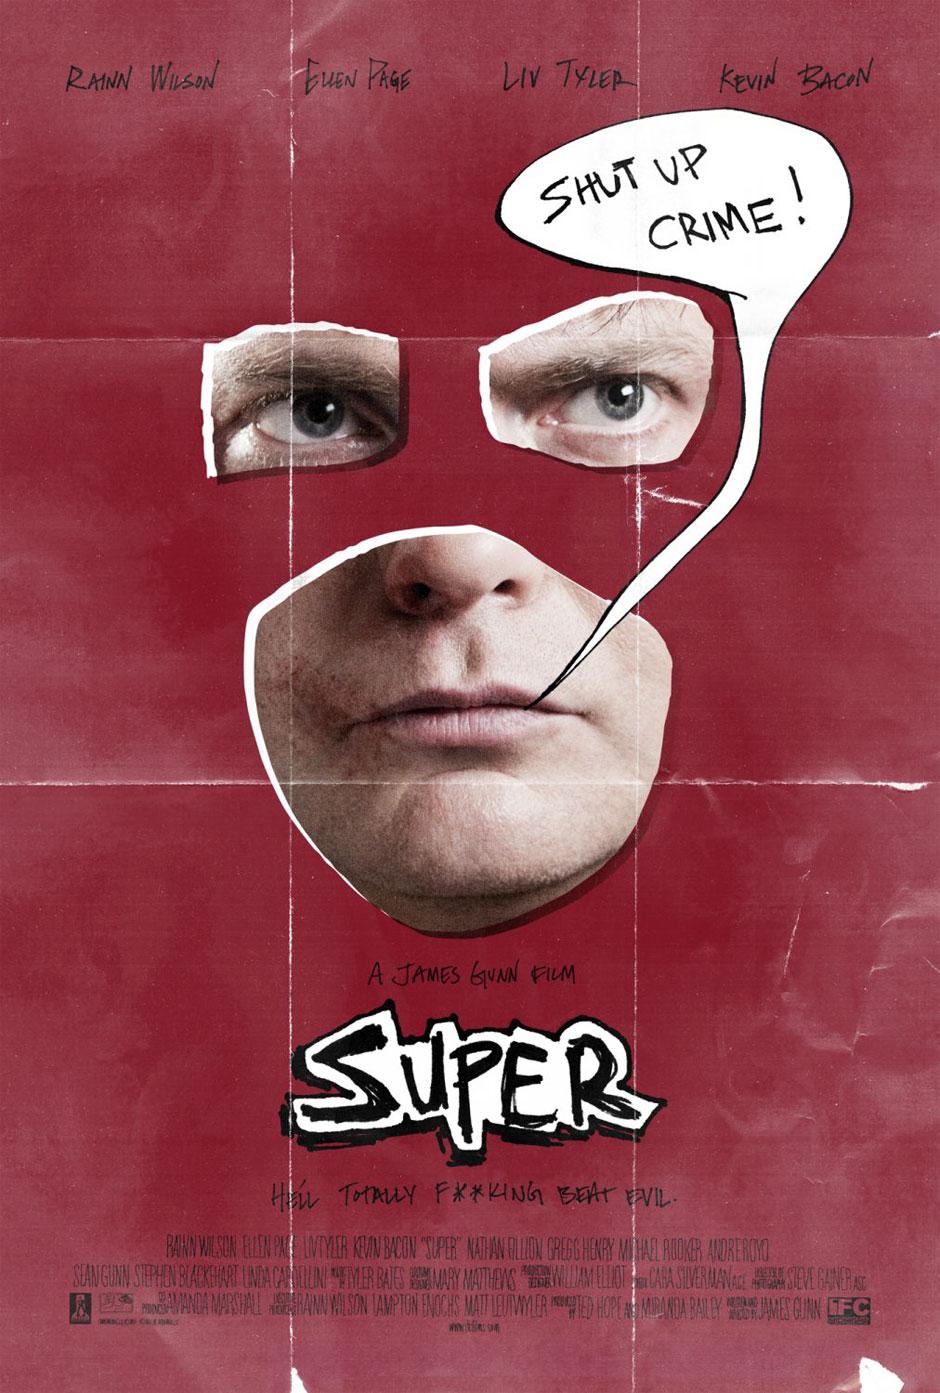 super-movie-poster.jpg